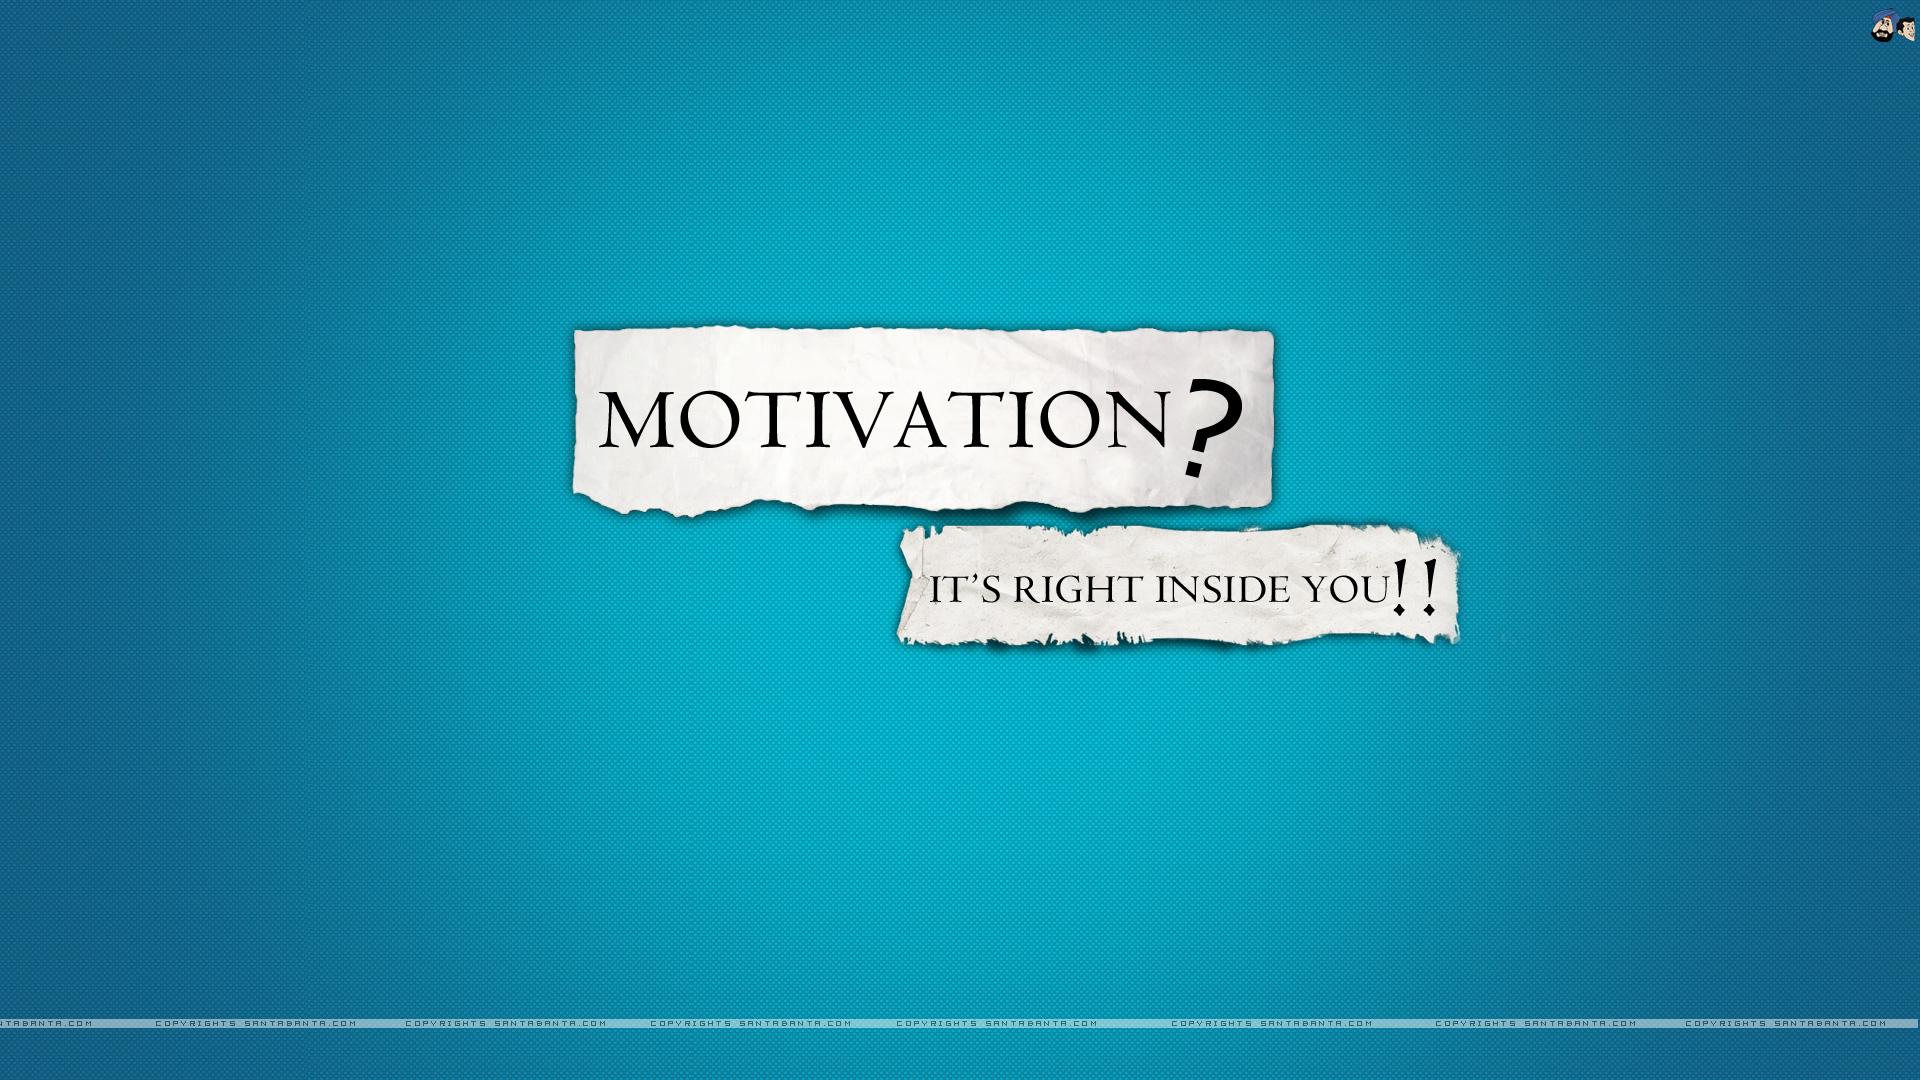 motivational wallpaper best wallpapers resources motivation 1920x1080